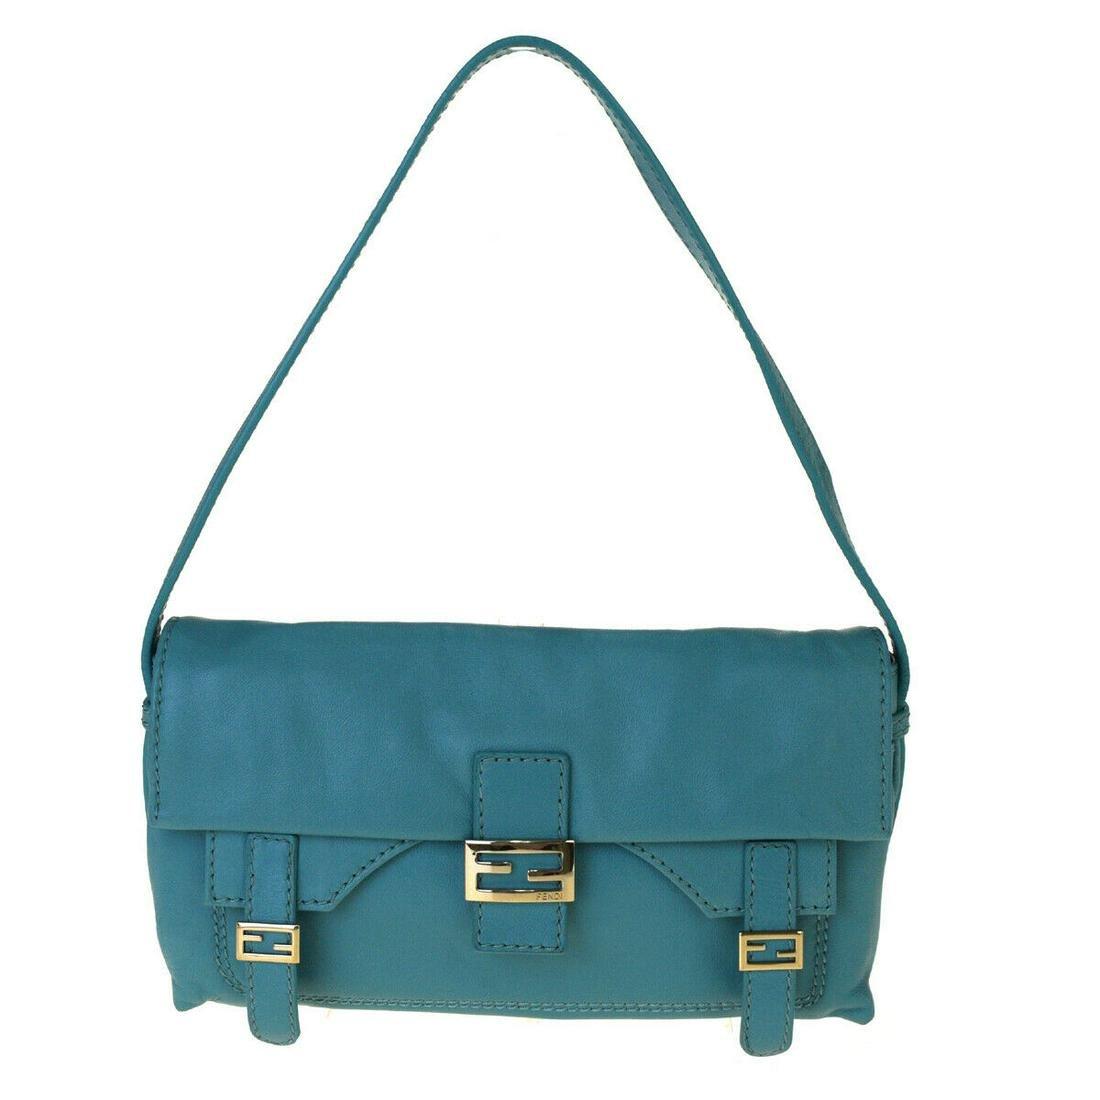 Authentic FENDI Leather Shoulder Bag